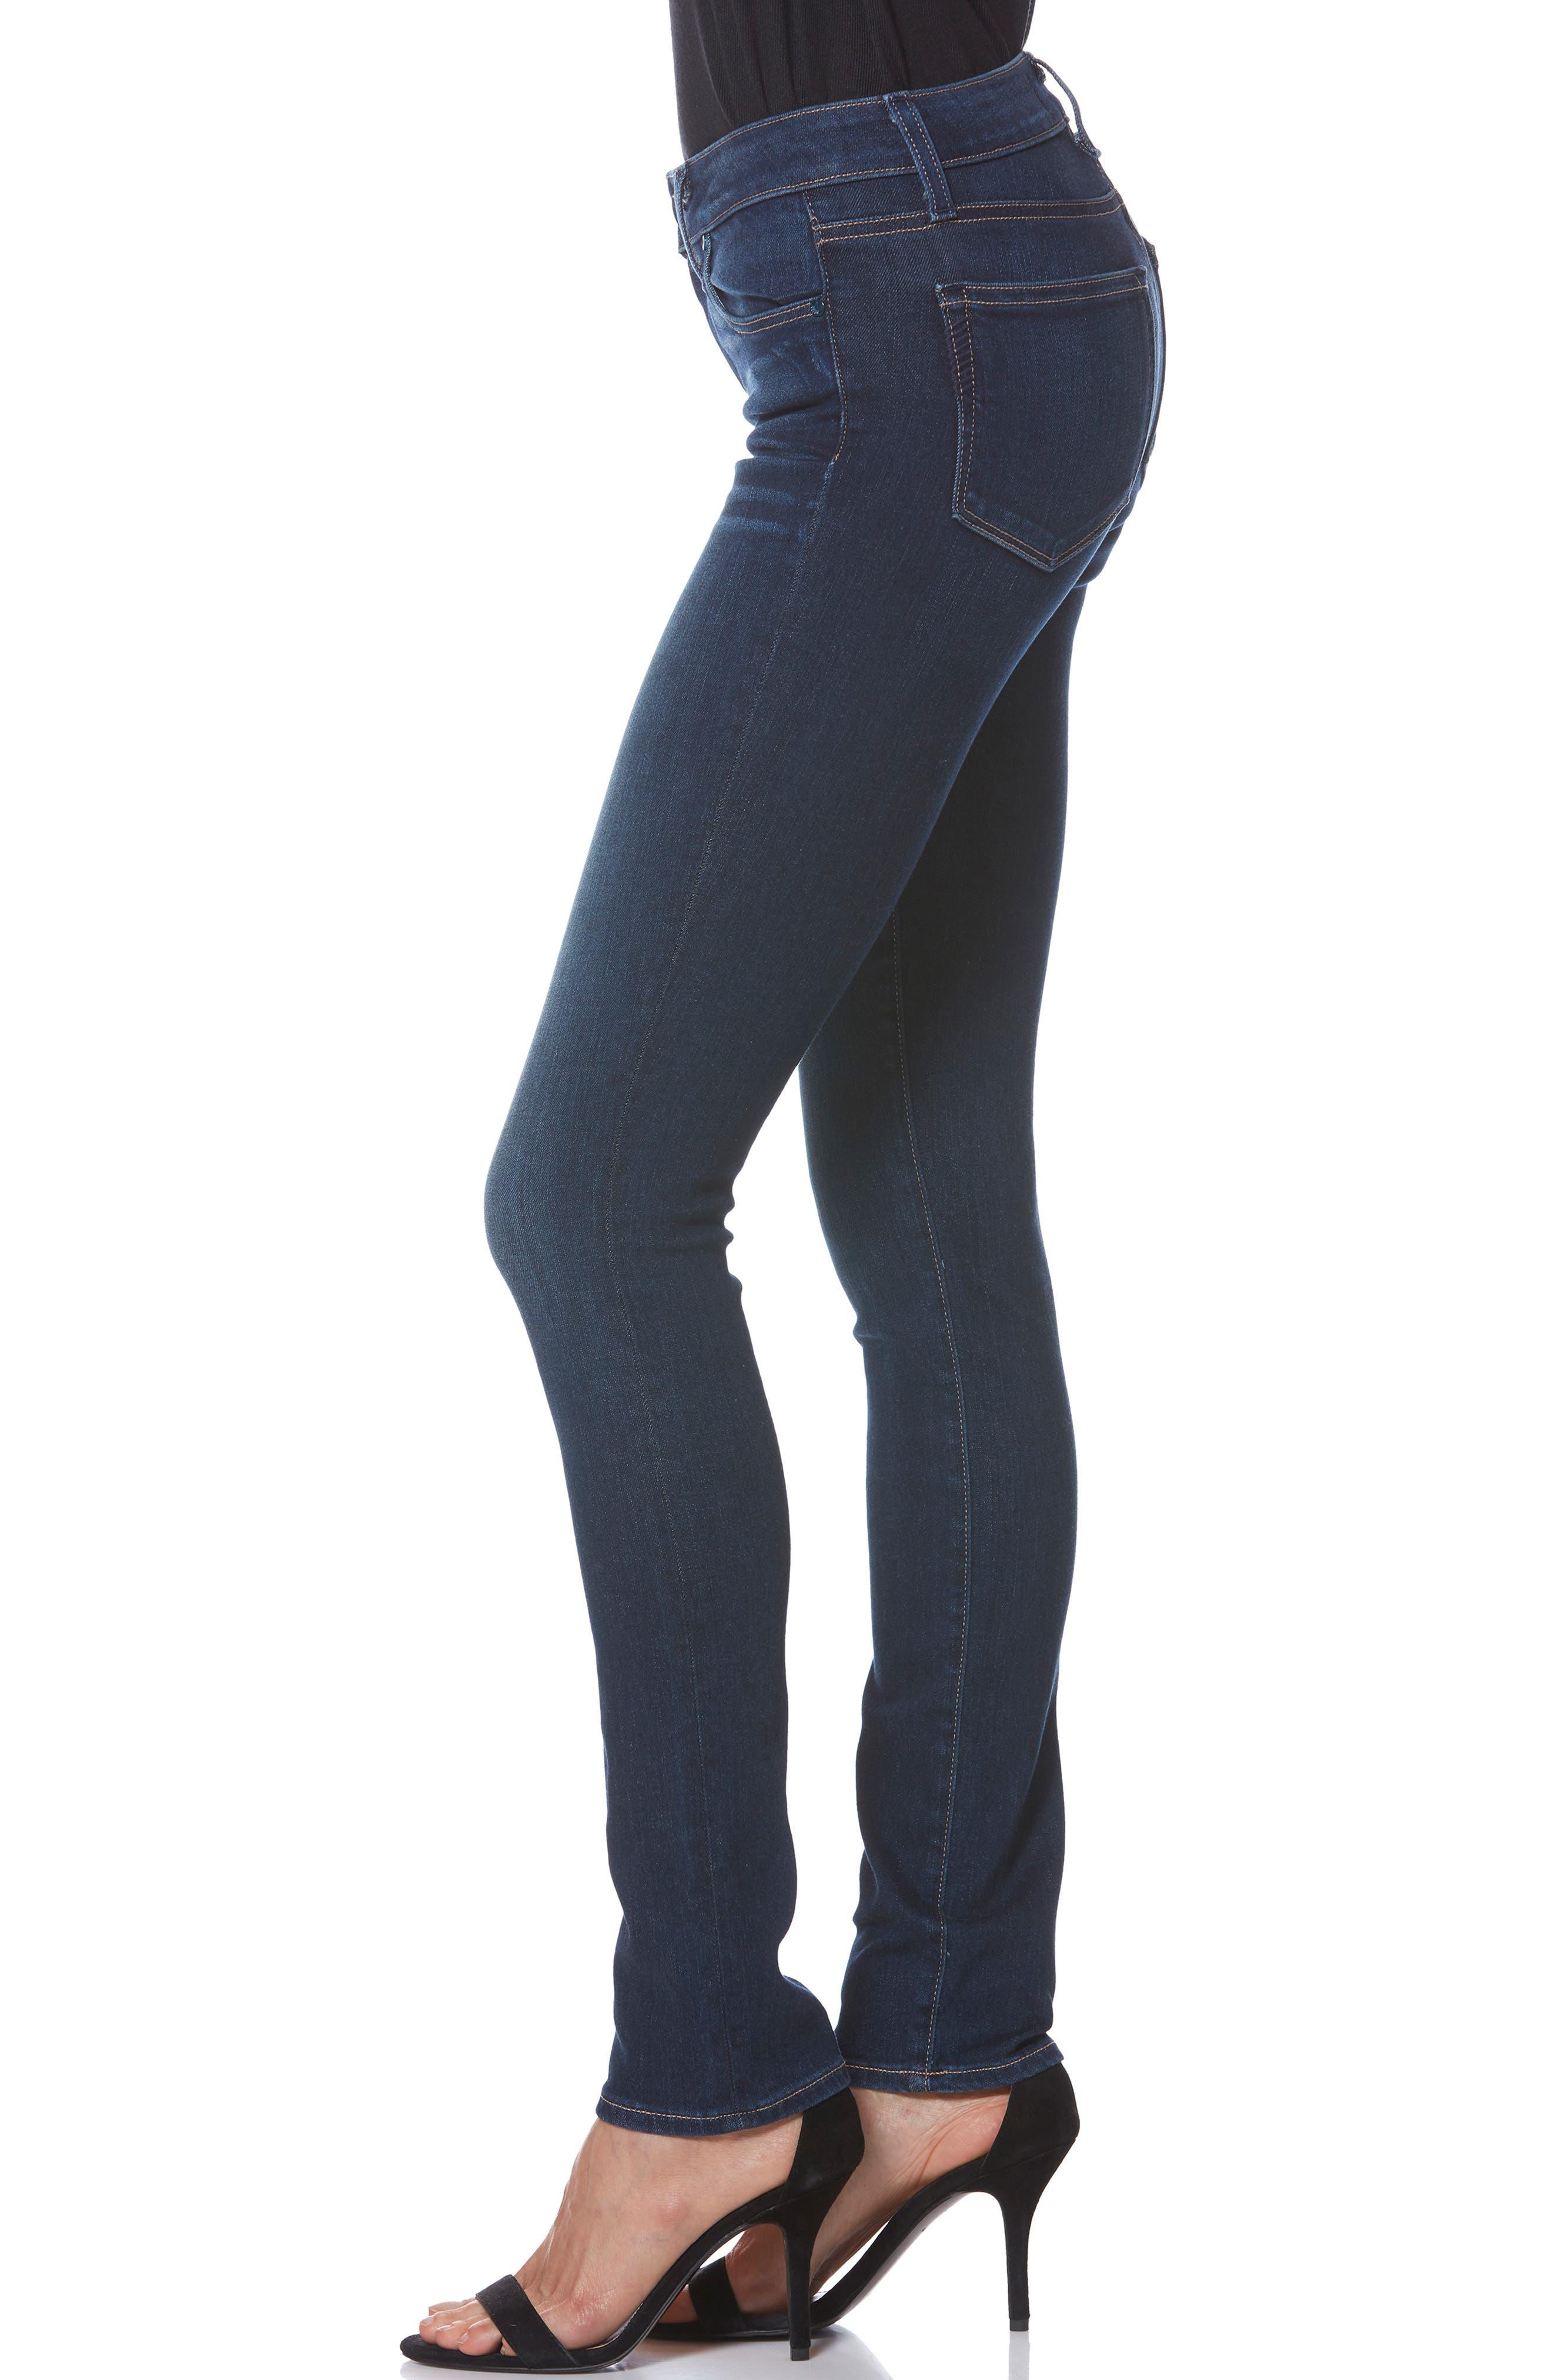 Skyline Skinny Jeans,                             Alternate thumbnail 3, color,                             IDLEWILD